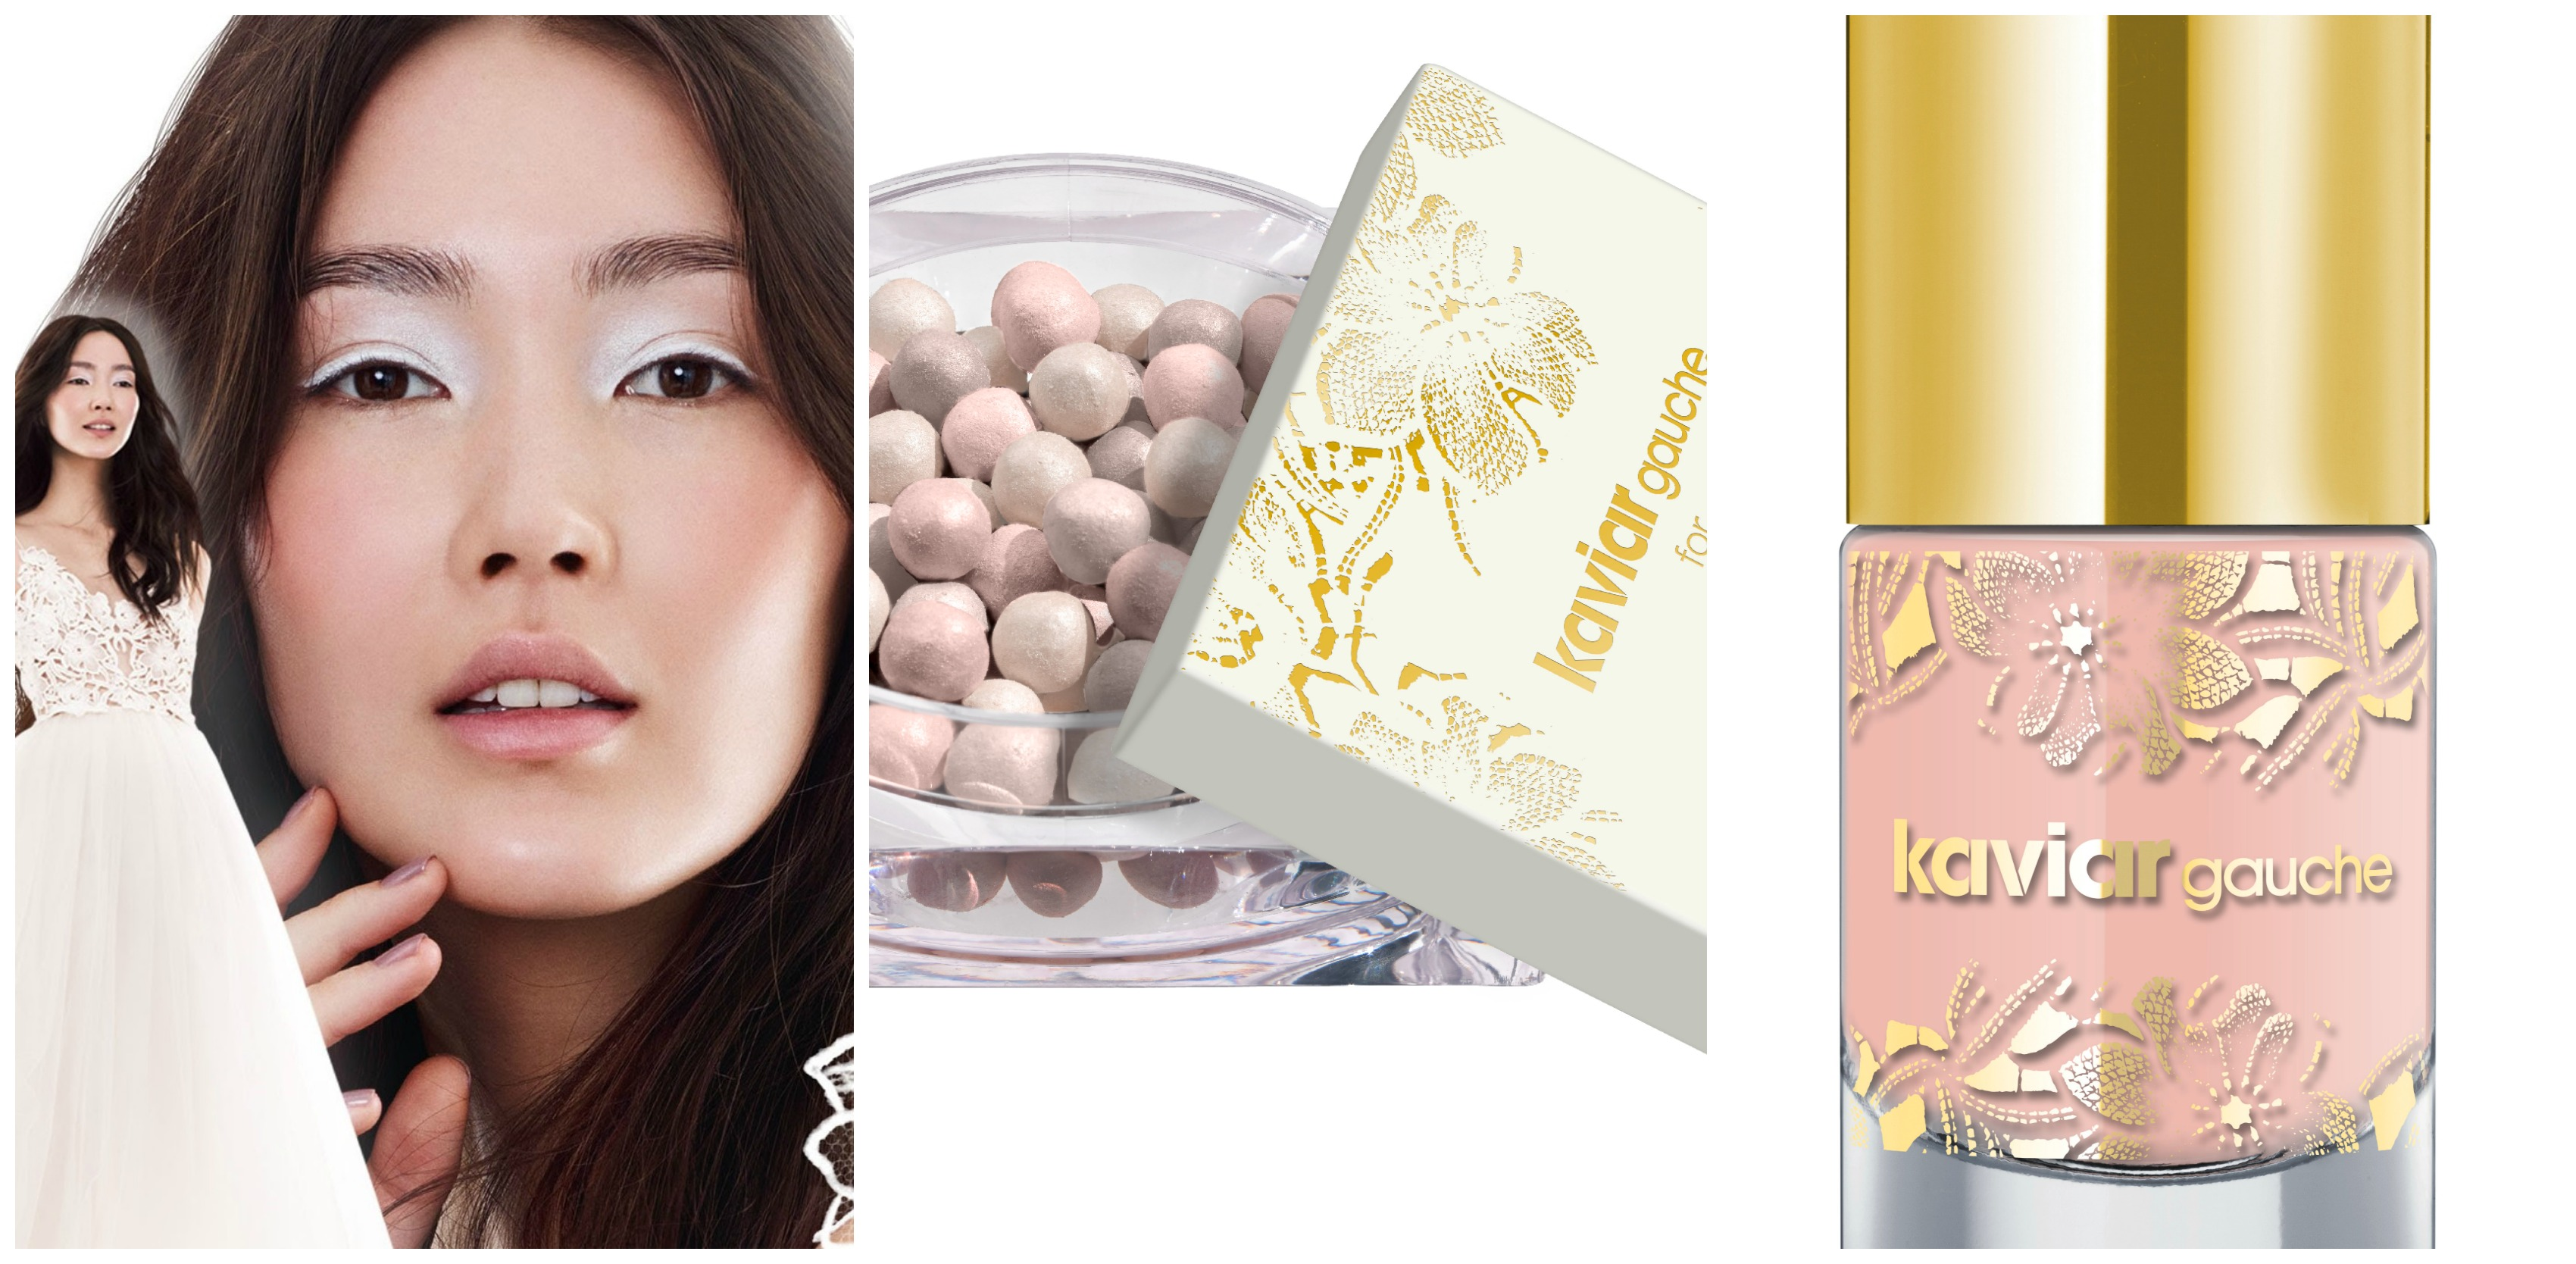 Catrice Kaviar Gauche-Kaviar Gauche For Catrice-GoodGirlsCompany-Beauty-make up-review